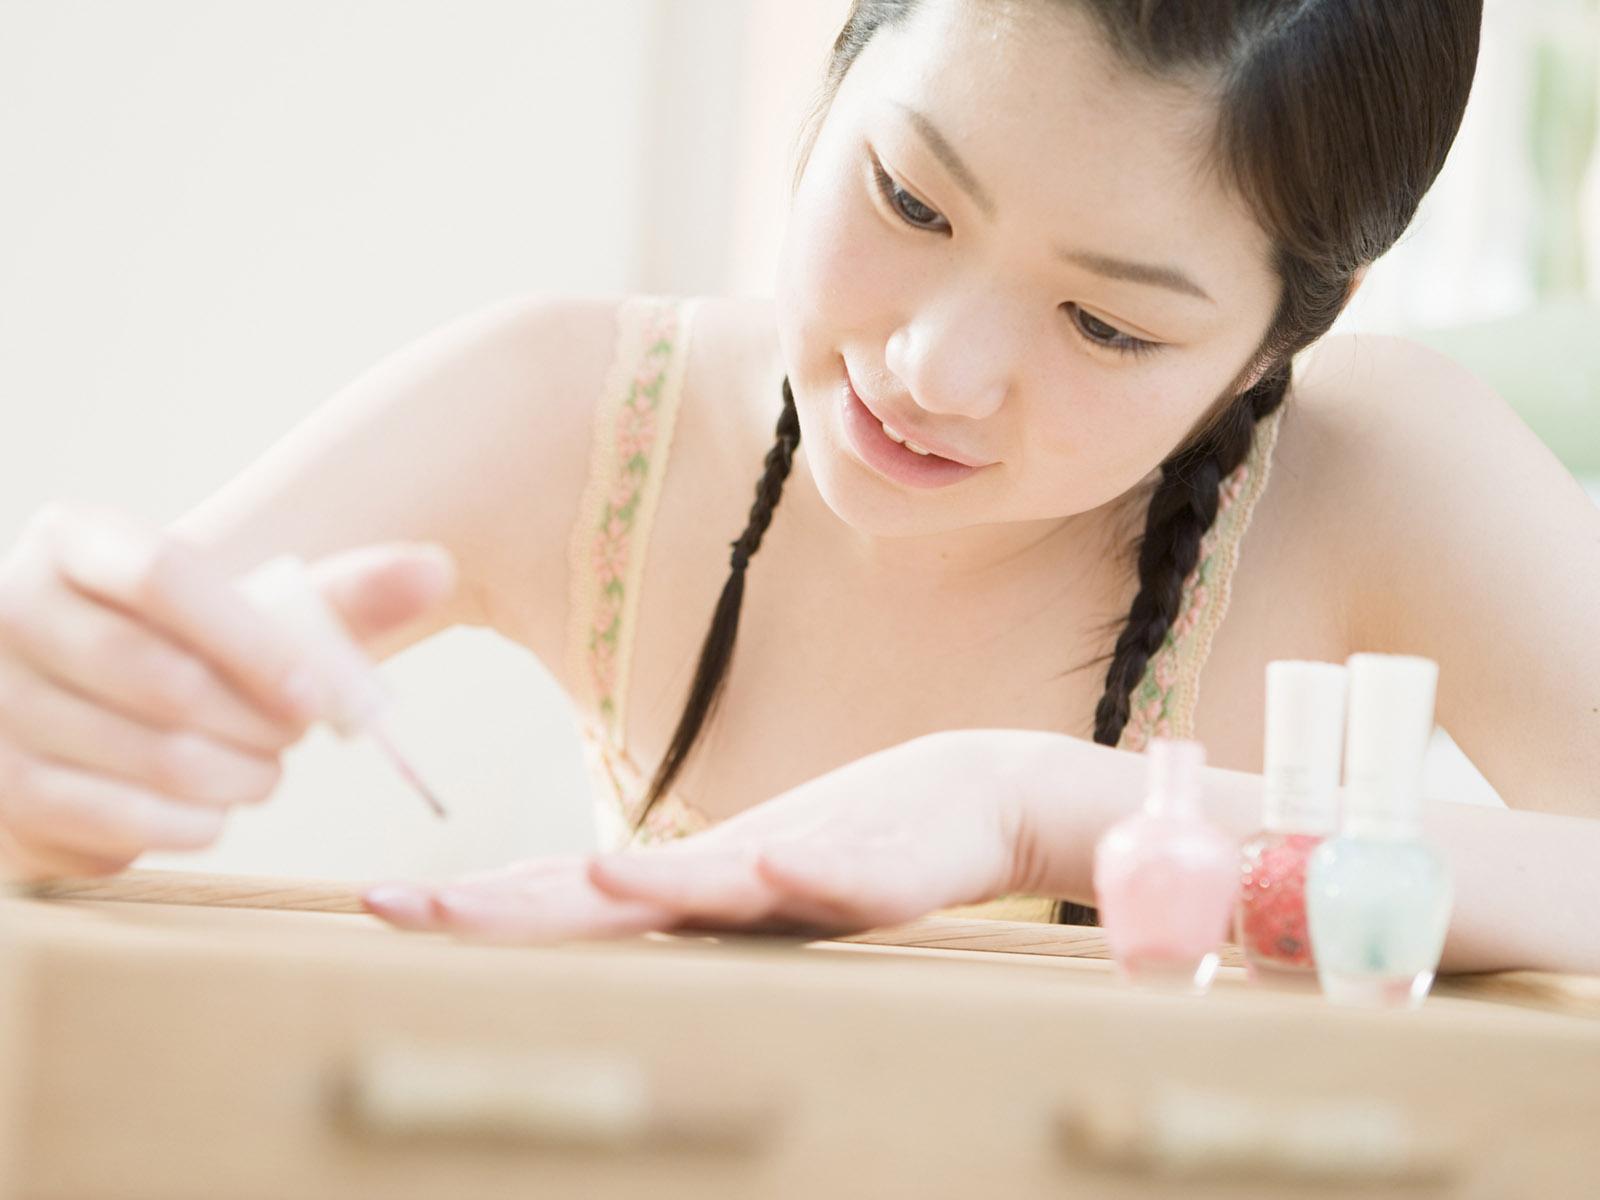 1600 1200 Spa Relaxation Photos Japanese Girls Skincare 1600x1200 Wallpaper Teahub Io